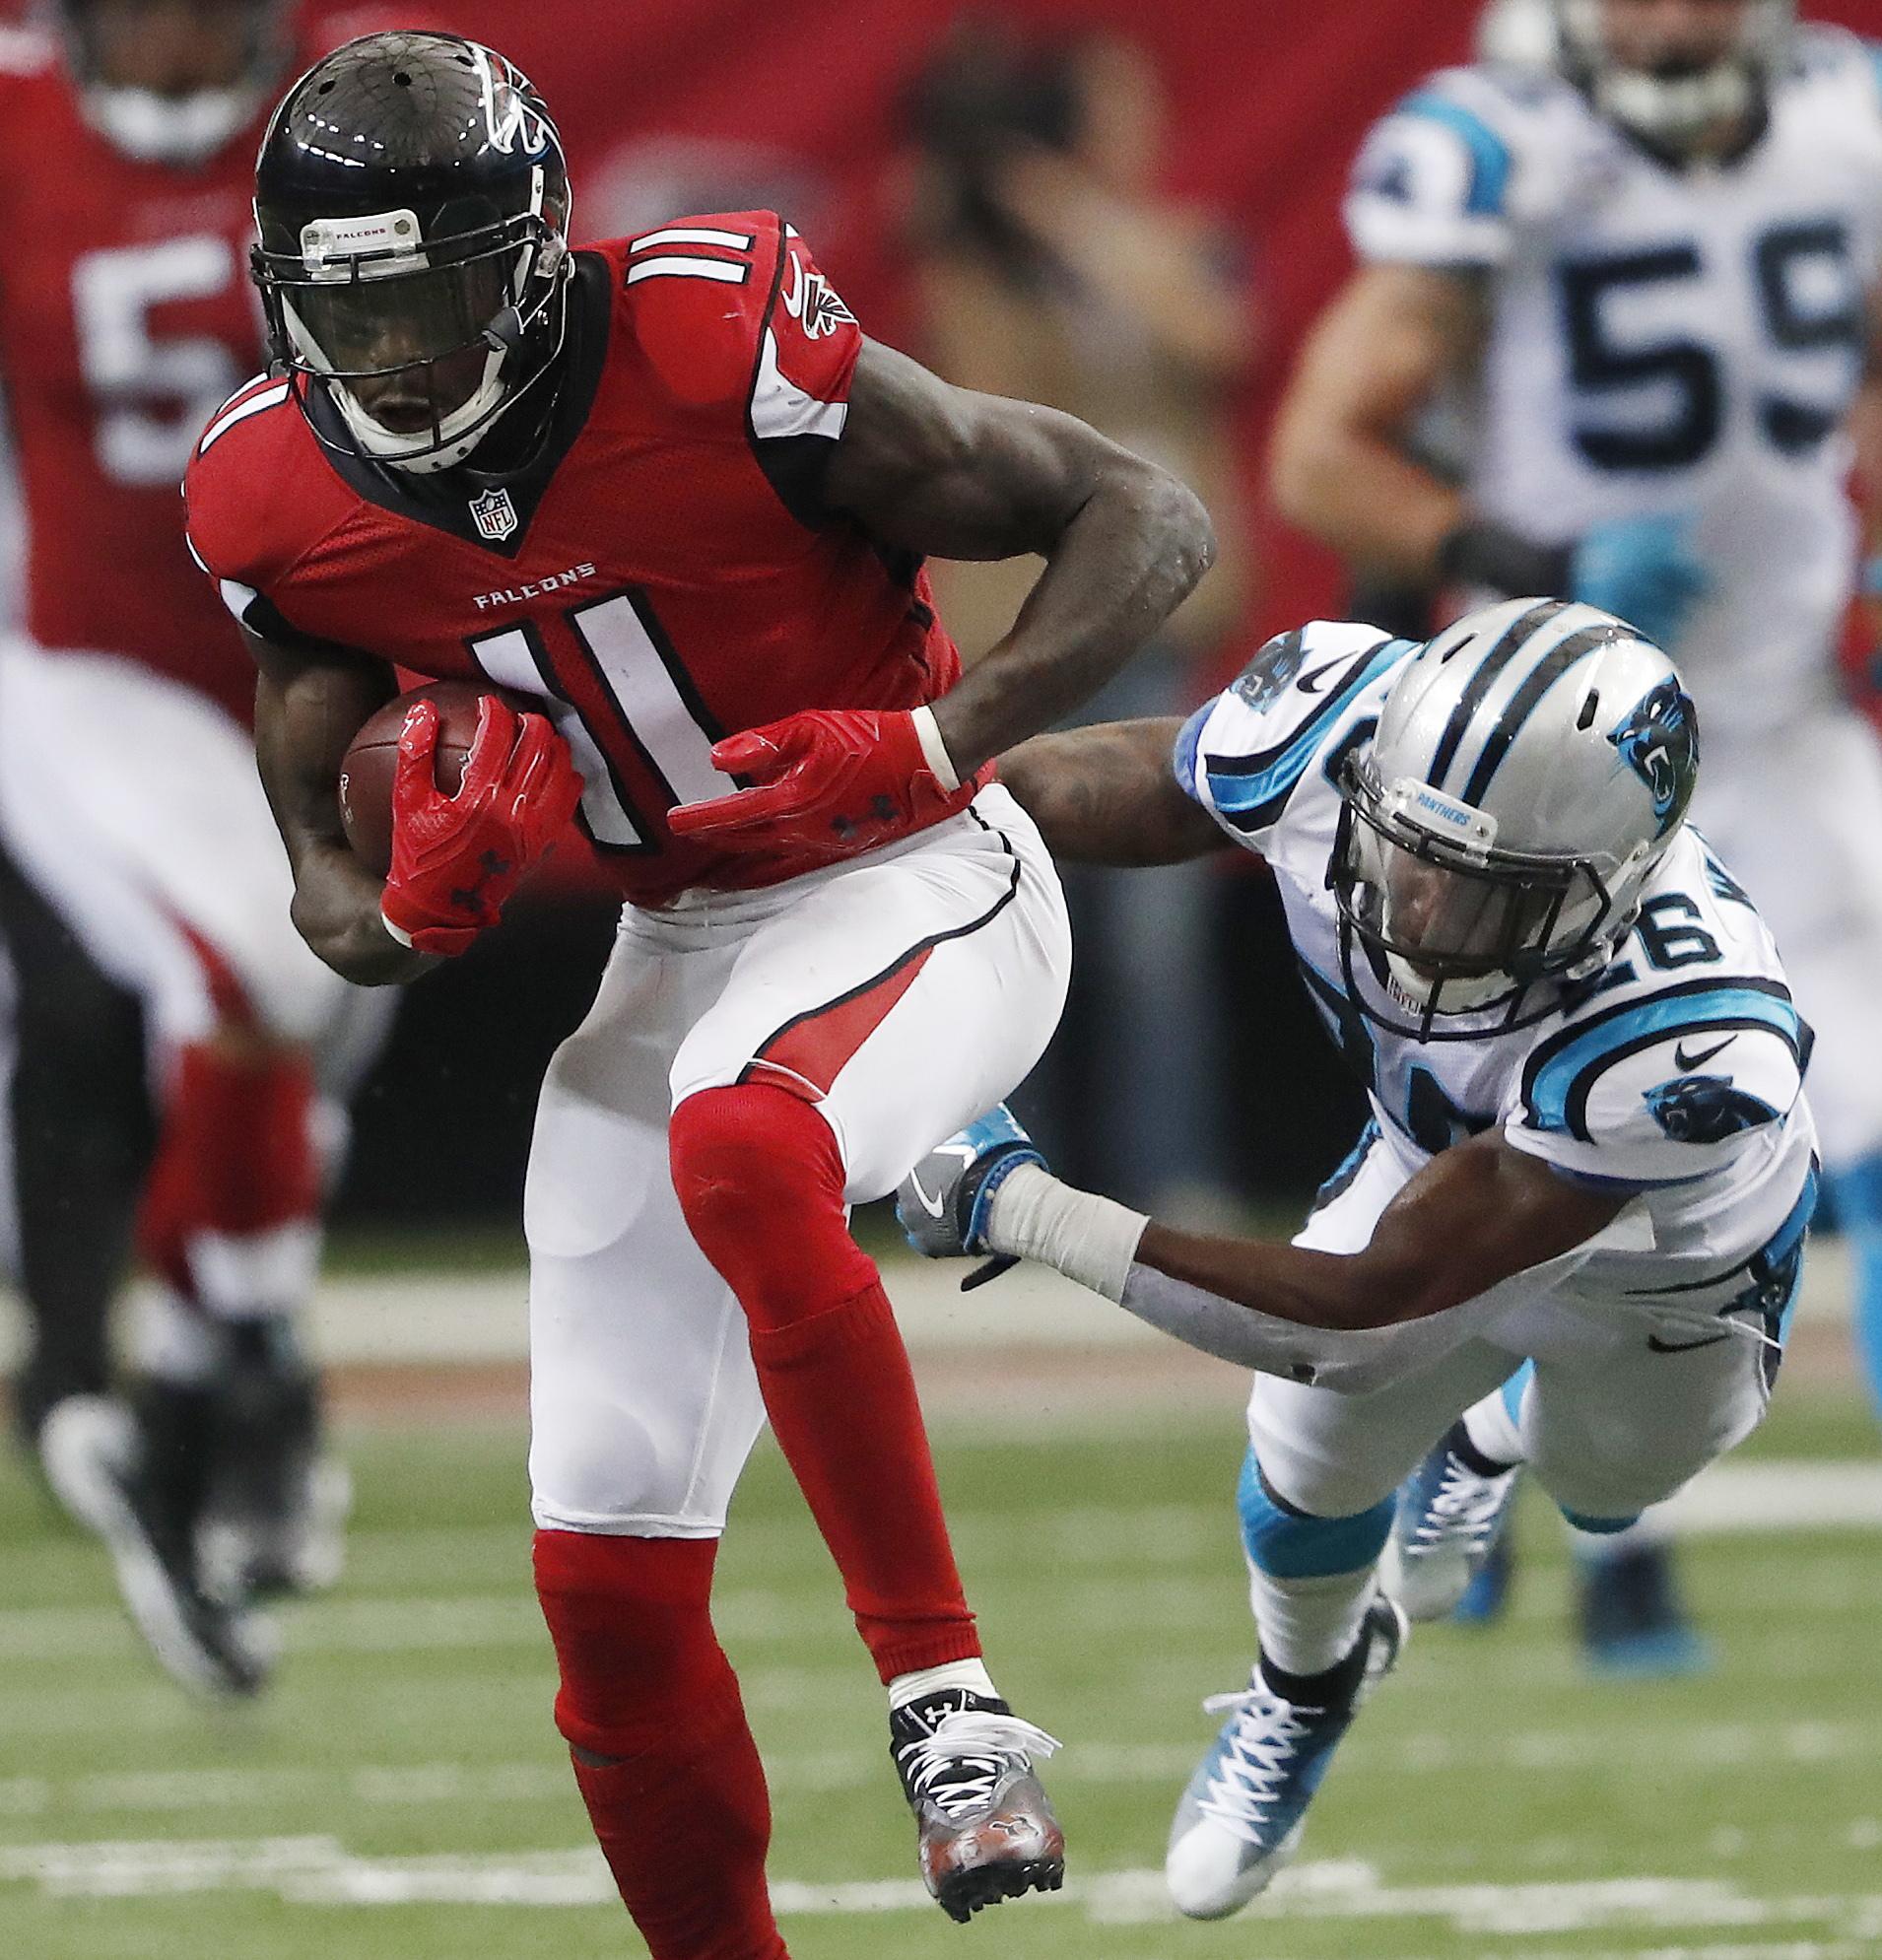 Atlanta Falcons wide receiver Julio Jones (11) runs past Carolina Panthers cornerback Daryl Worley (26) during the second half of an NFL football game, Sunday, Oct. 2, 2016, in Atlanta.  (AP Photo/John Bazemore)